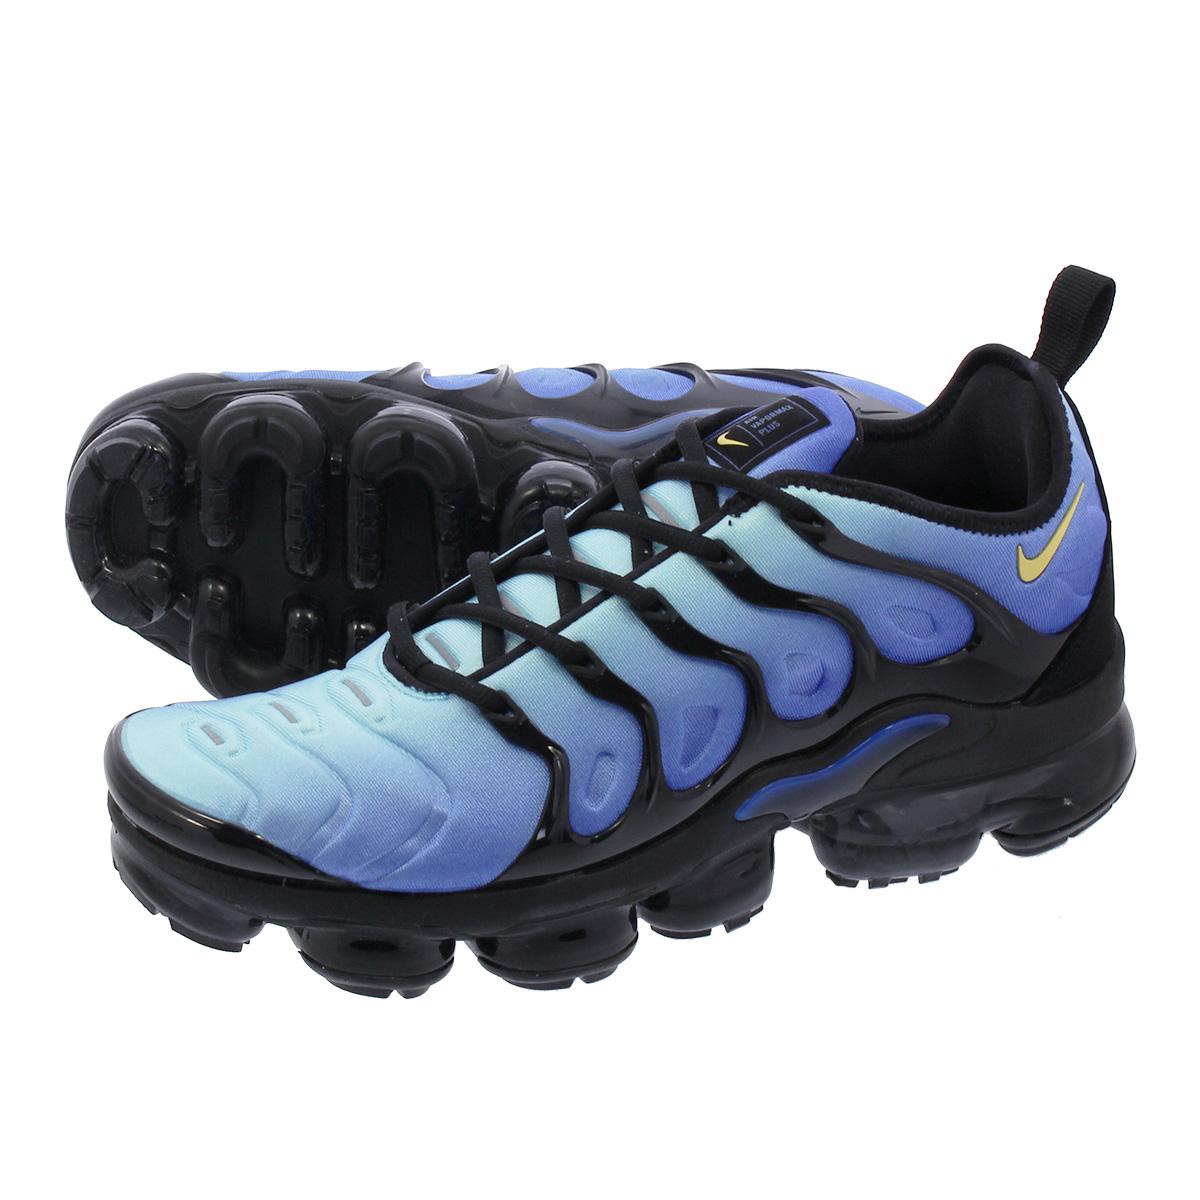 hot sale online d48ee 9b28f NIKE AIR VAPORMAX PLUS Nike vapor max plus BLACK/CHAMPOIS/HYPER BLUE  924,453-008